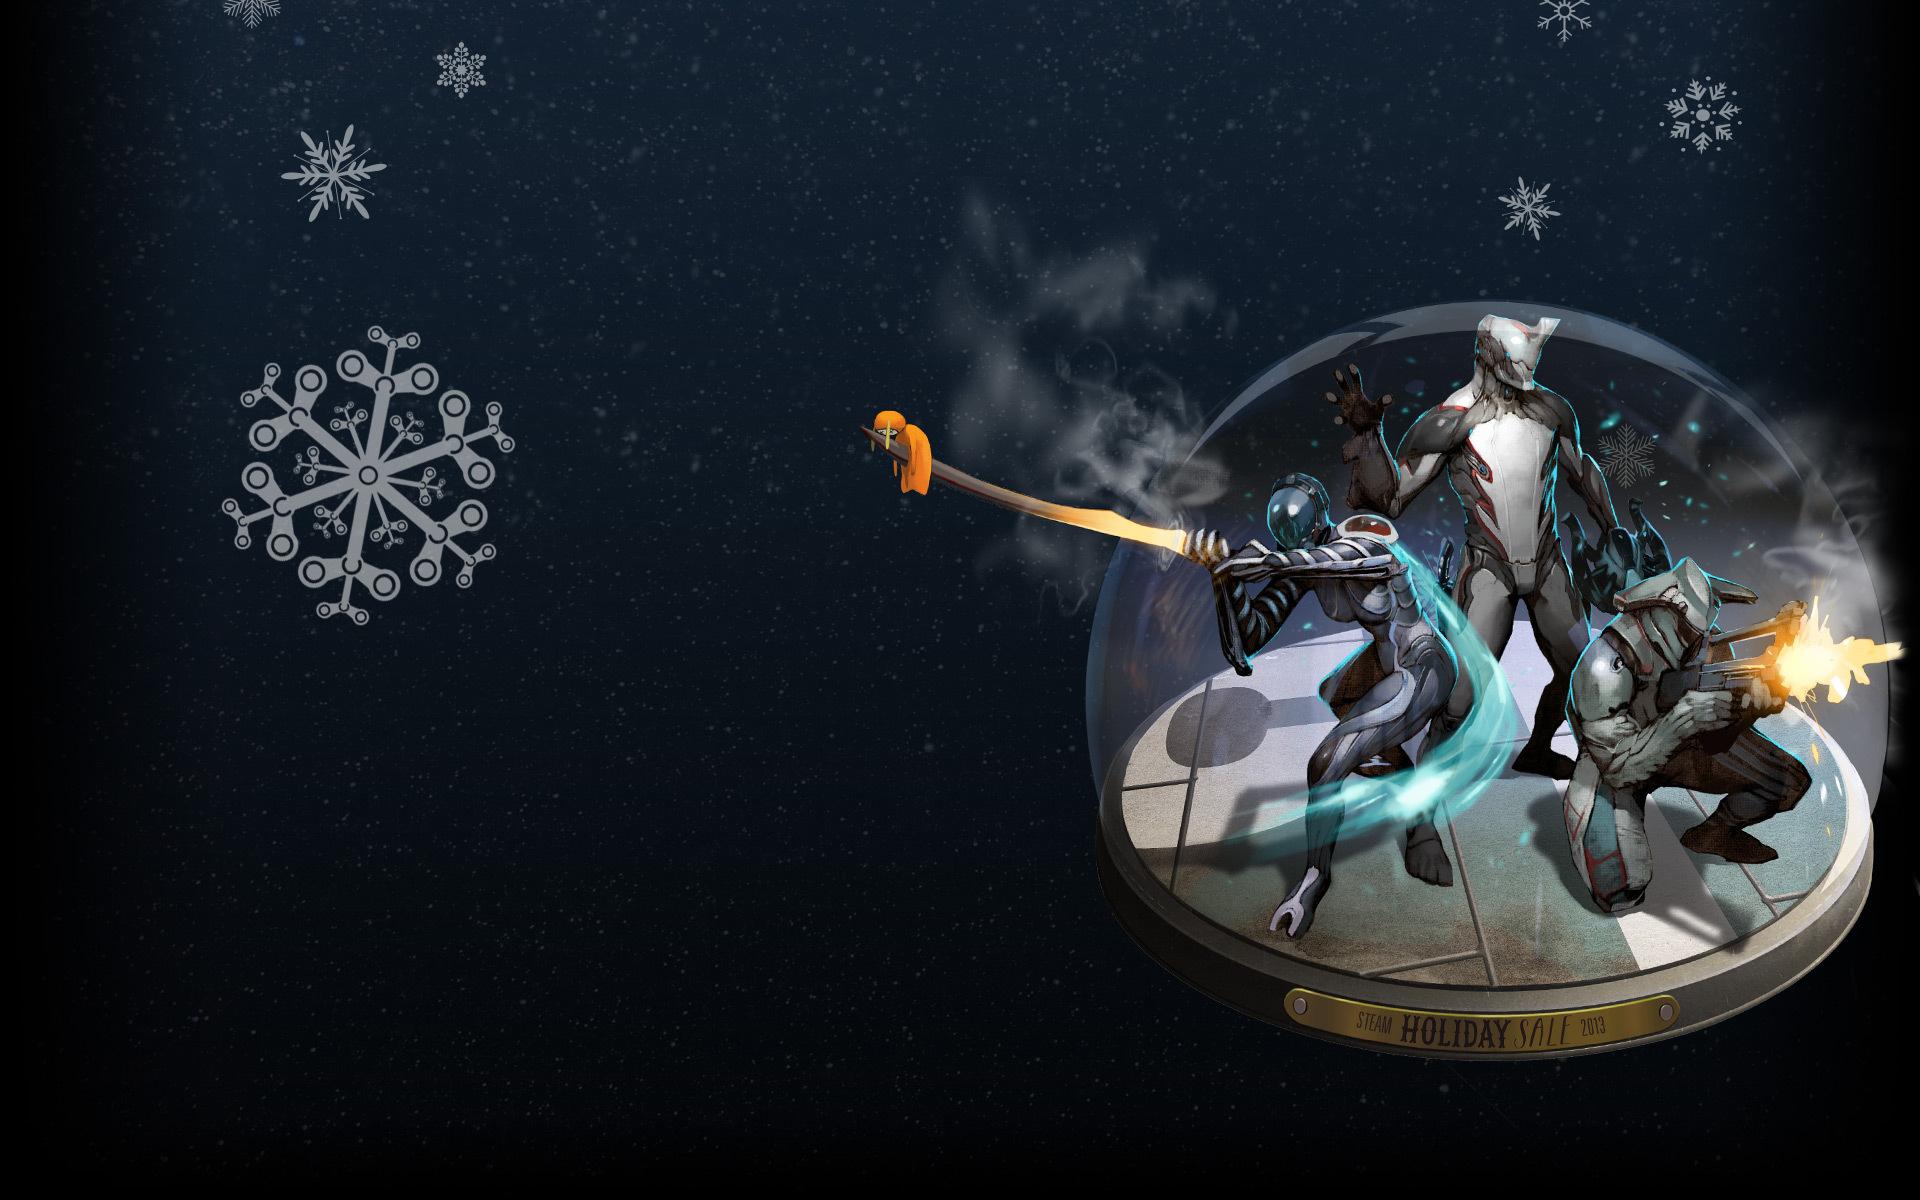 Holiday Sale 2013 - Warframe